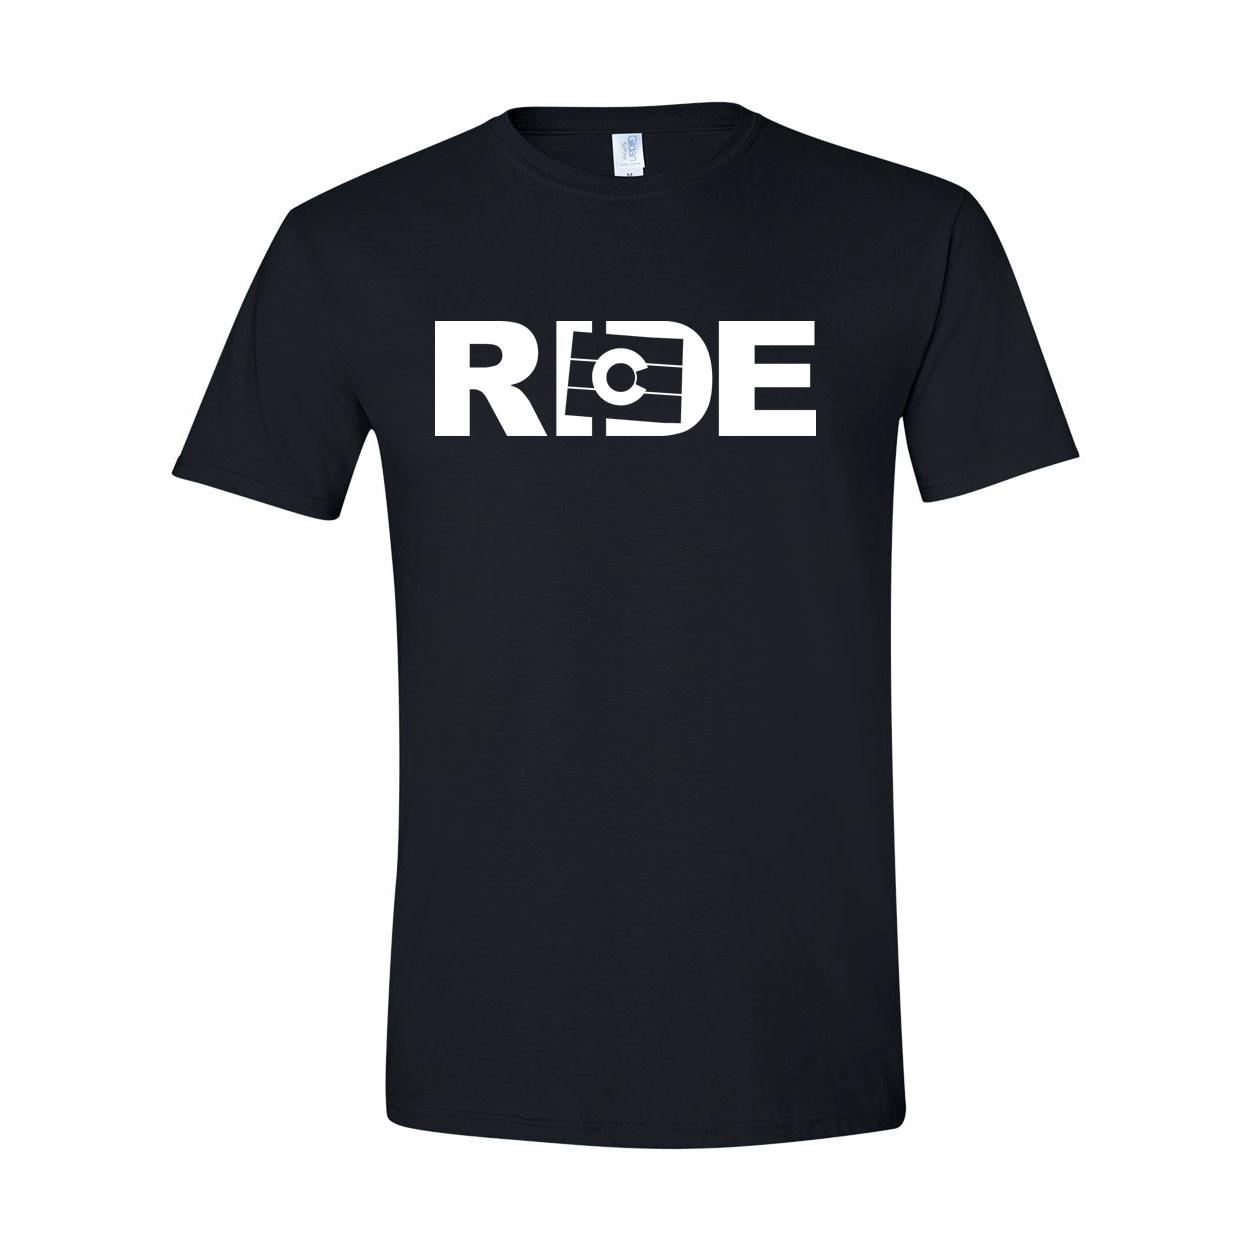 Ride Colorado Classic T-Shirt Black (White Logo)